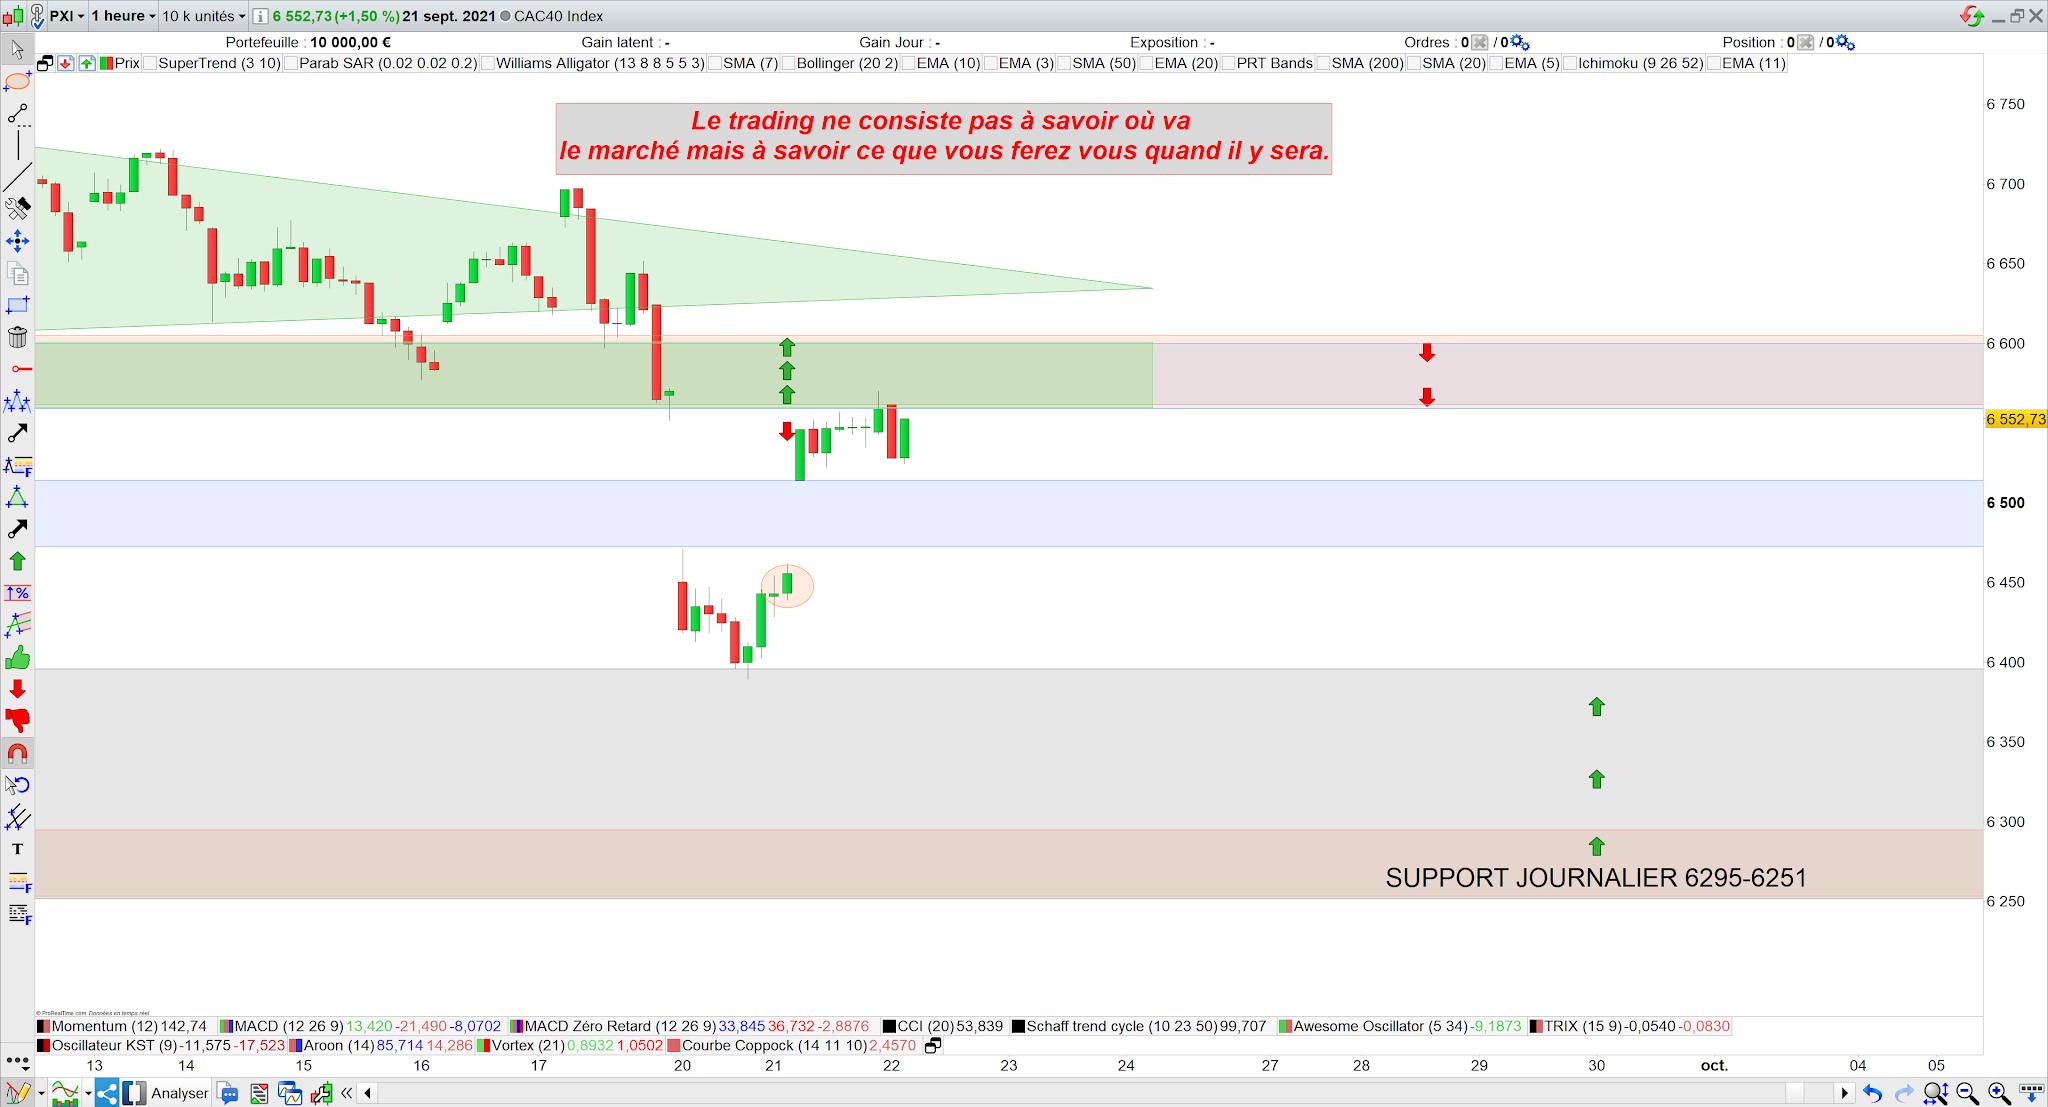 Bilan trading cac40 21/09/21